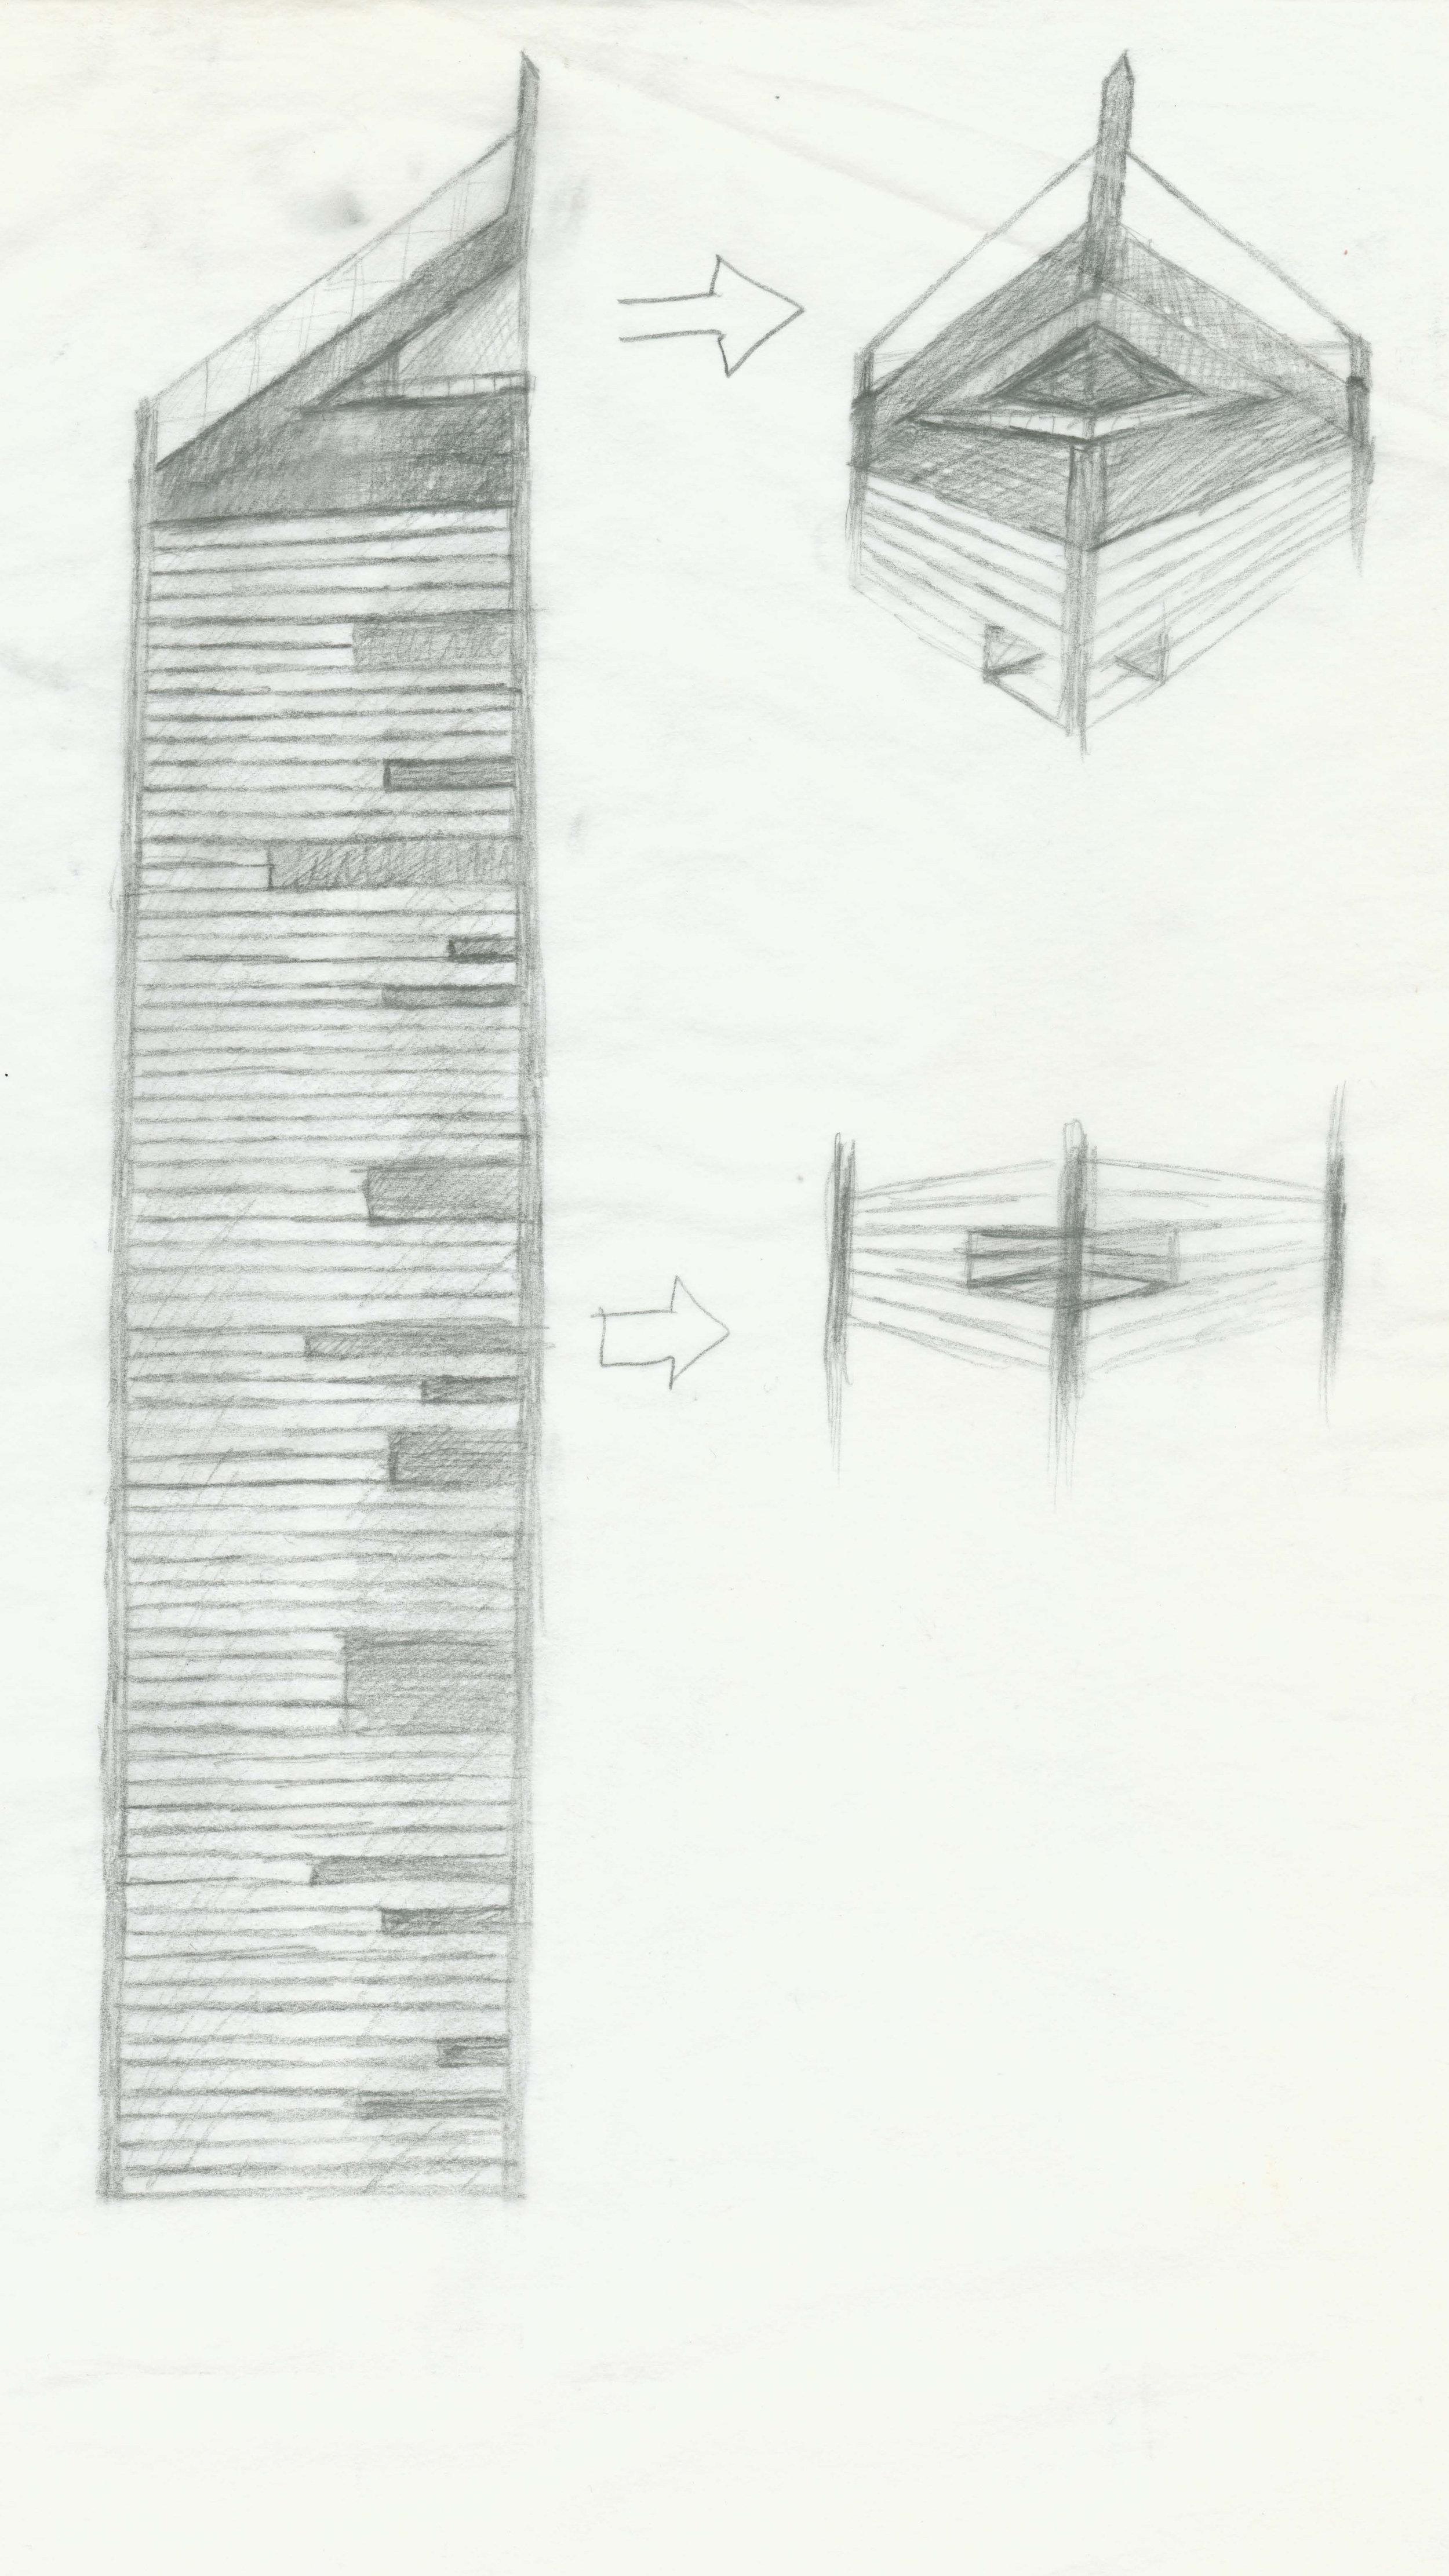 Skyscraper - Drawings 3.jpg